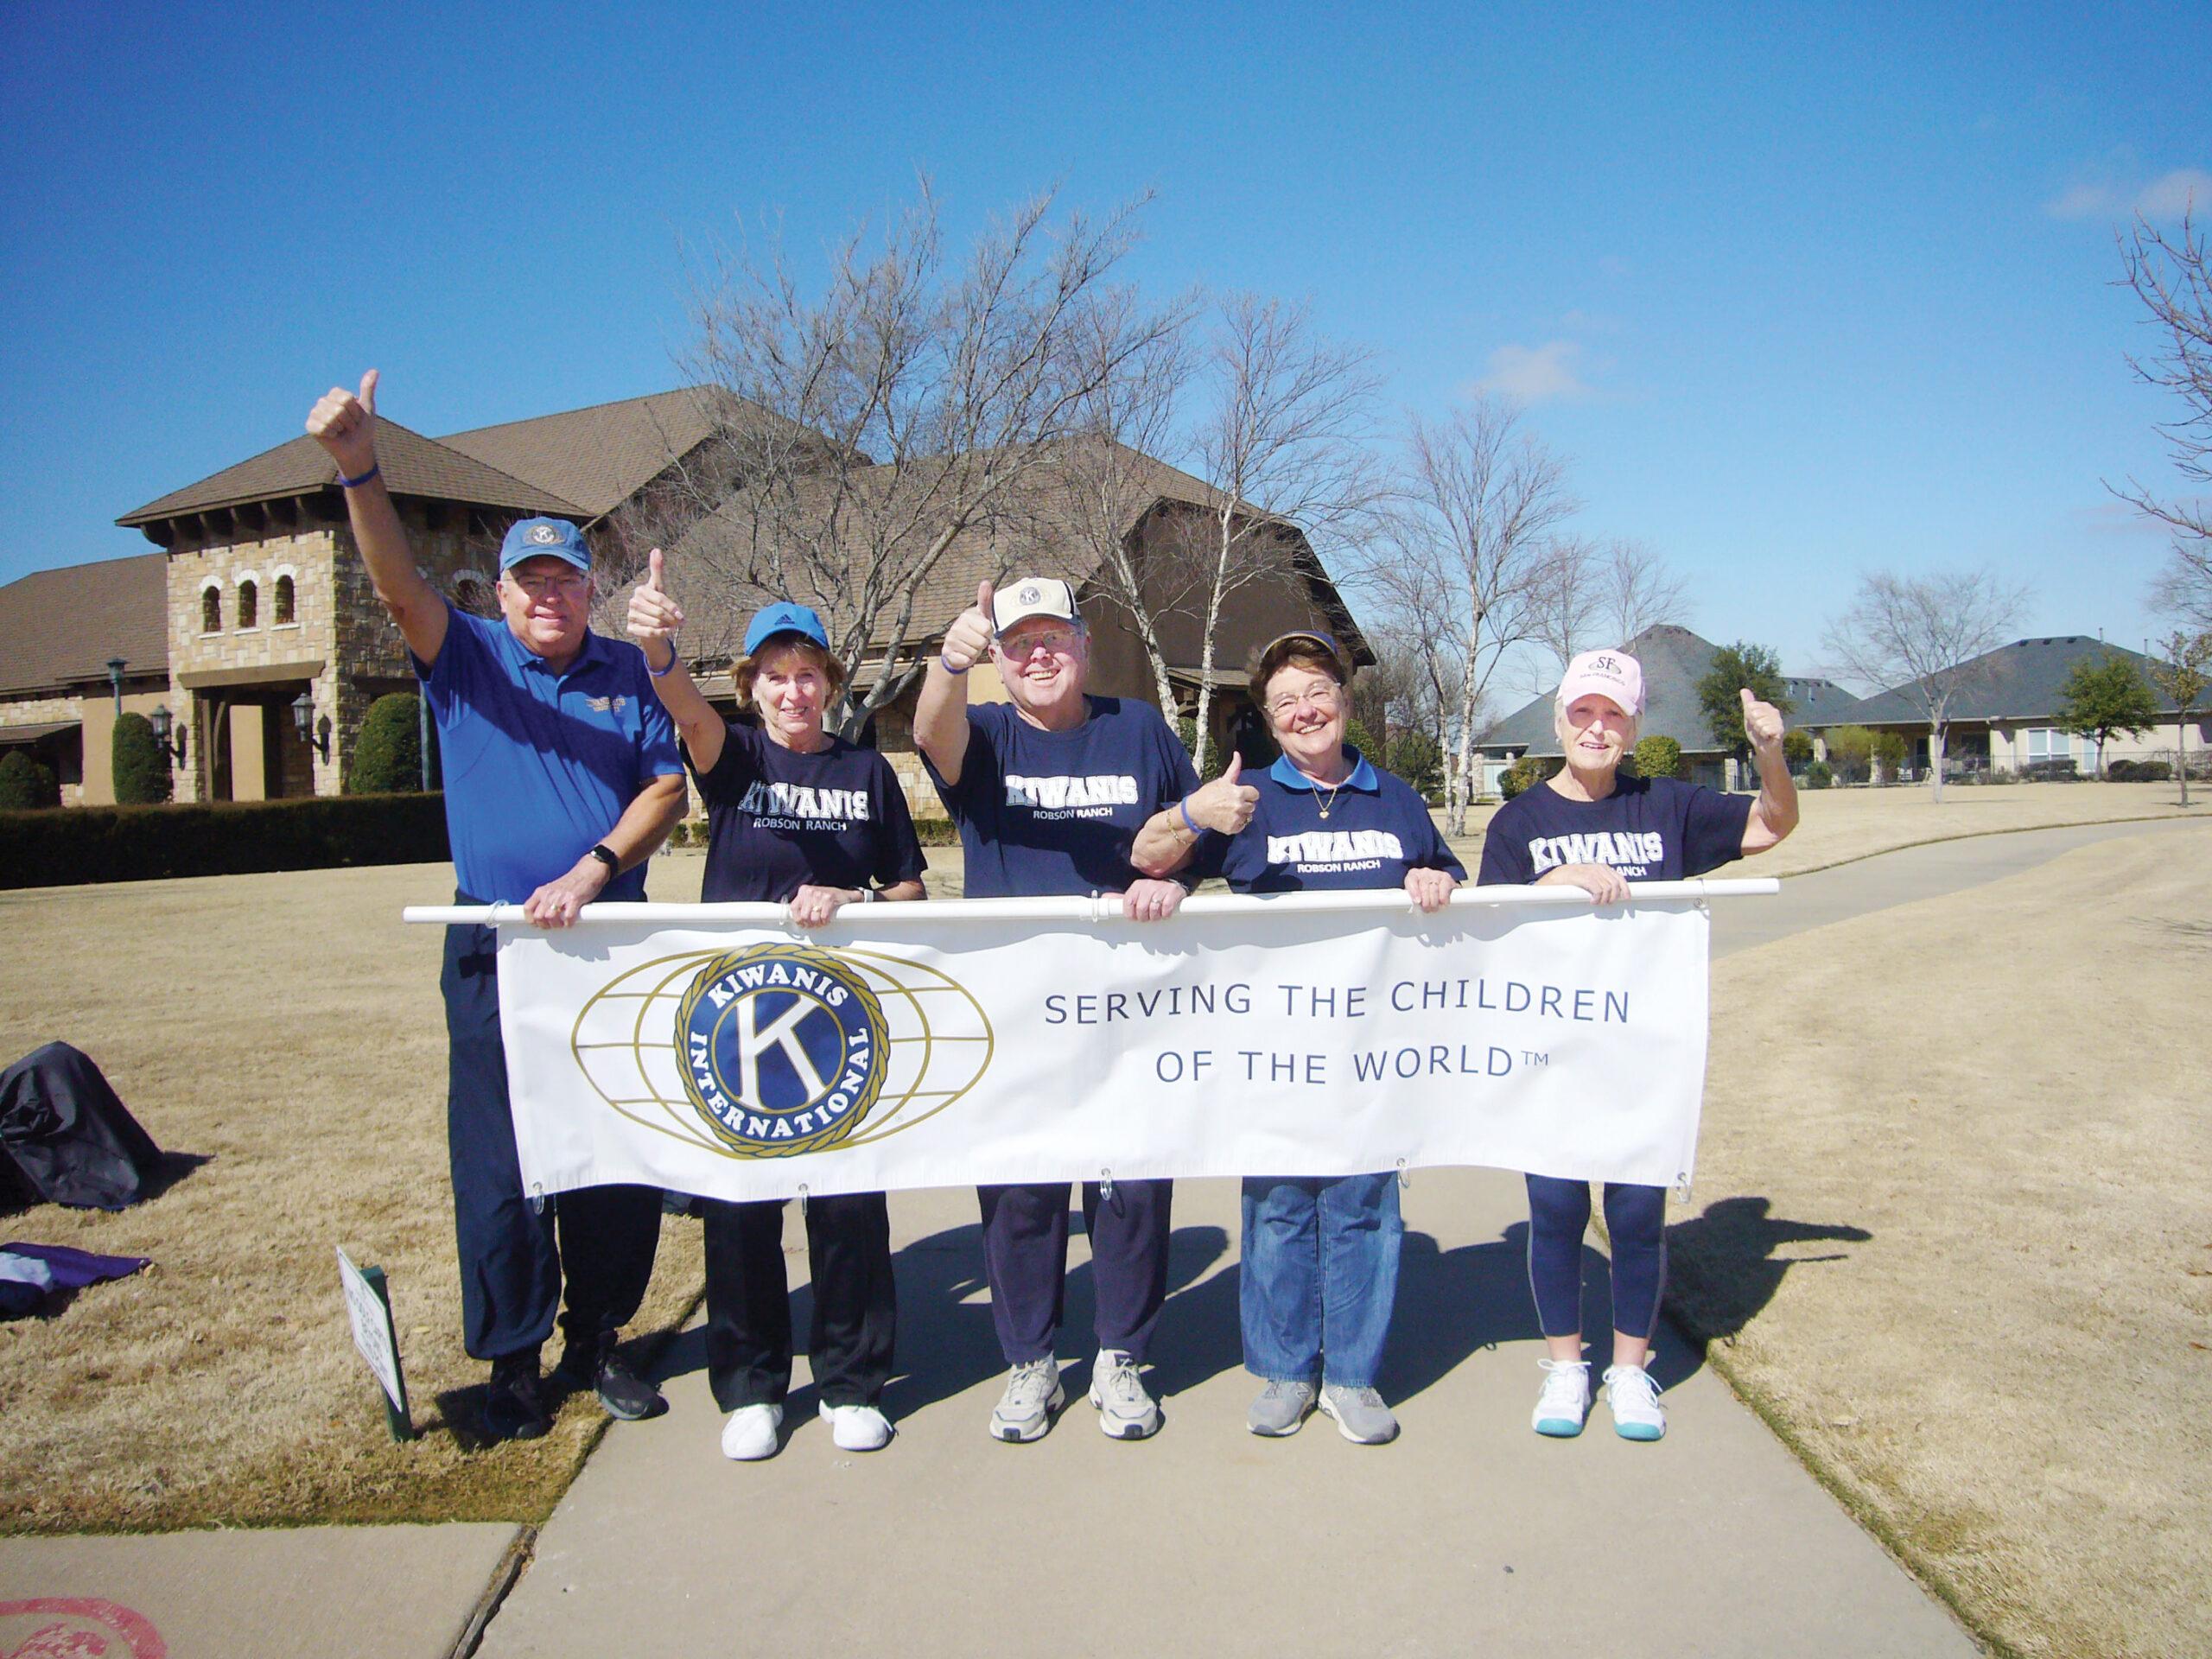 Roy Meyer, Chris Mershon, Jim and Susan Galbraith, along with Pat Hamblin, are ready to walk the two miles Kiwanis CAP Walkathon on April 10, 2021.